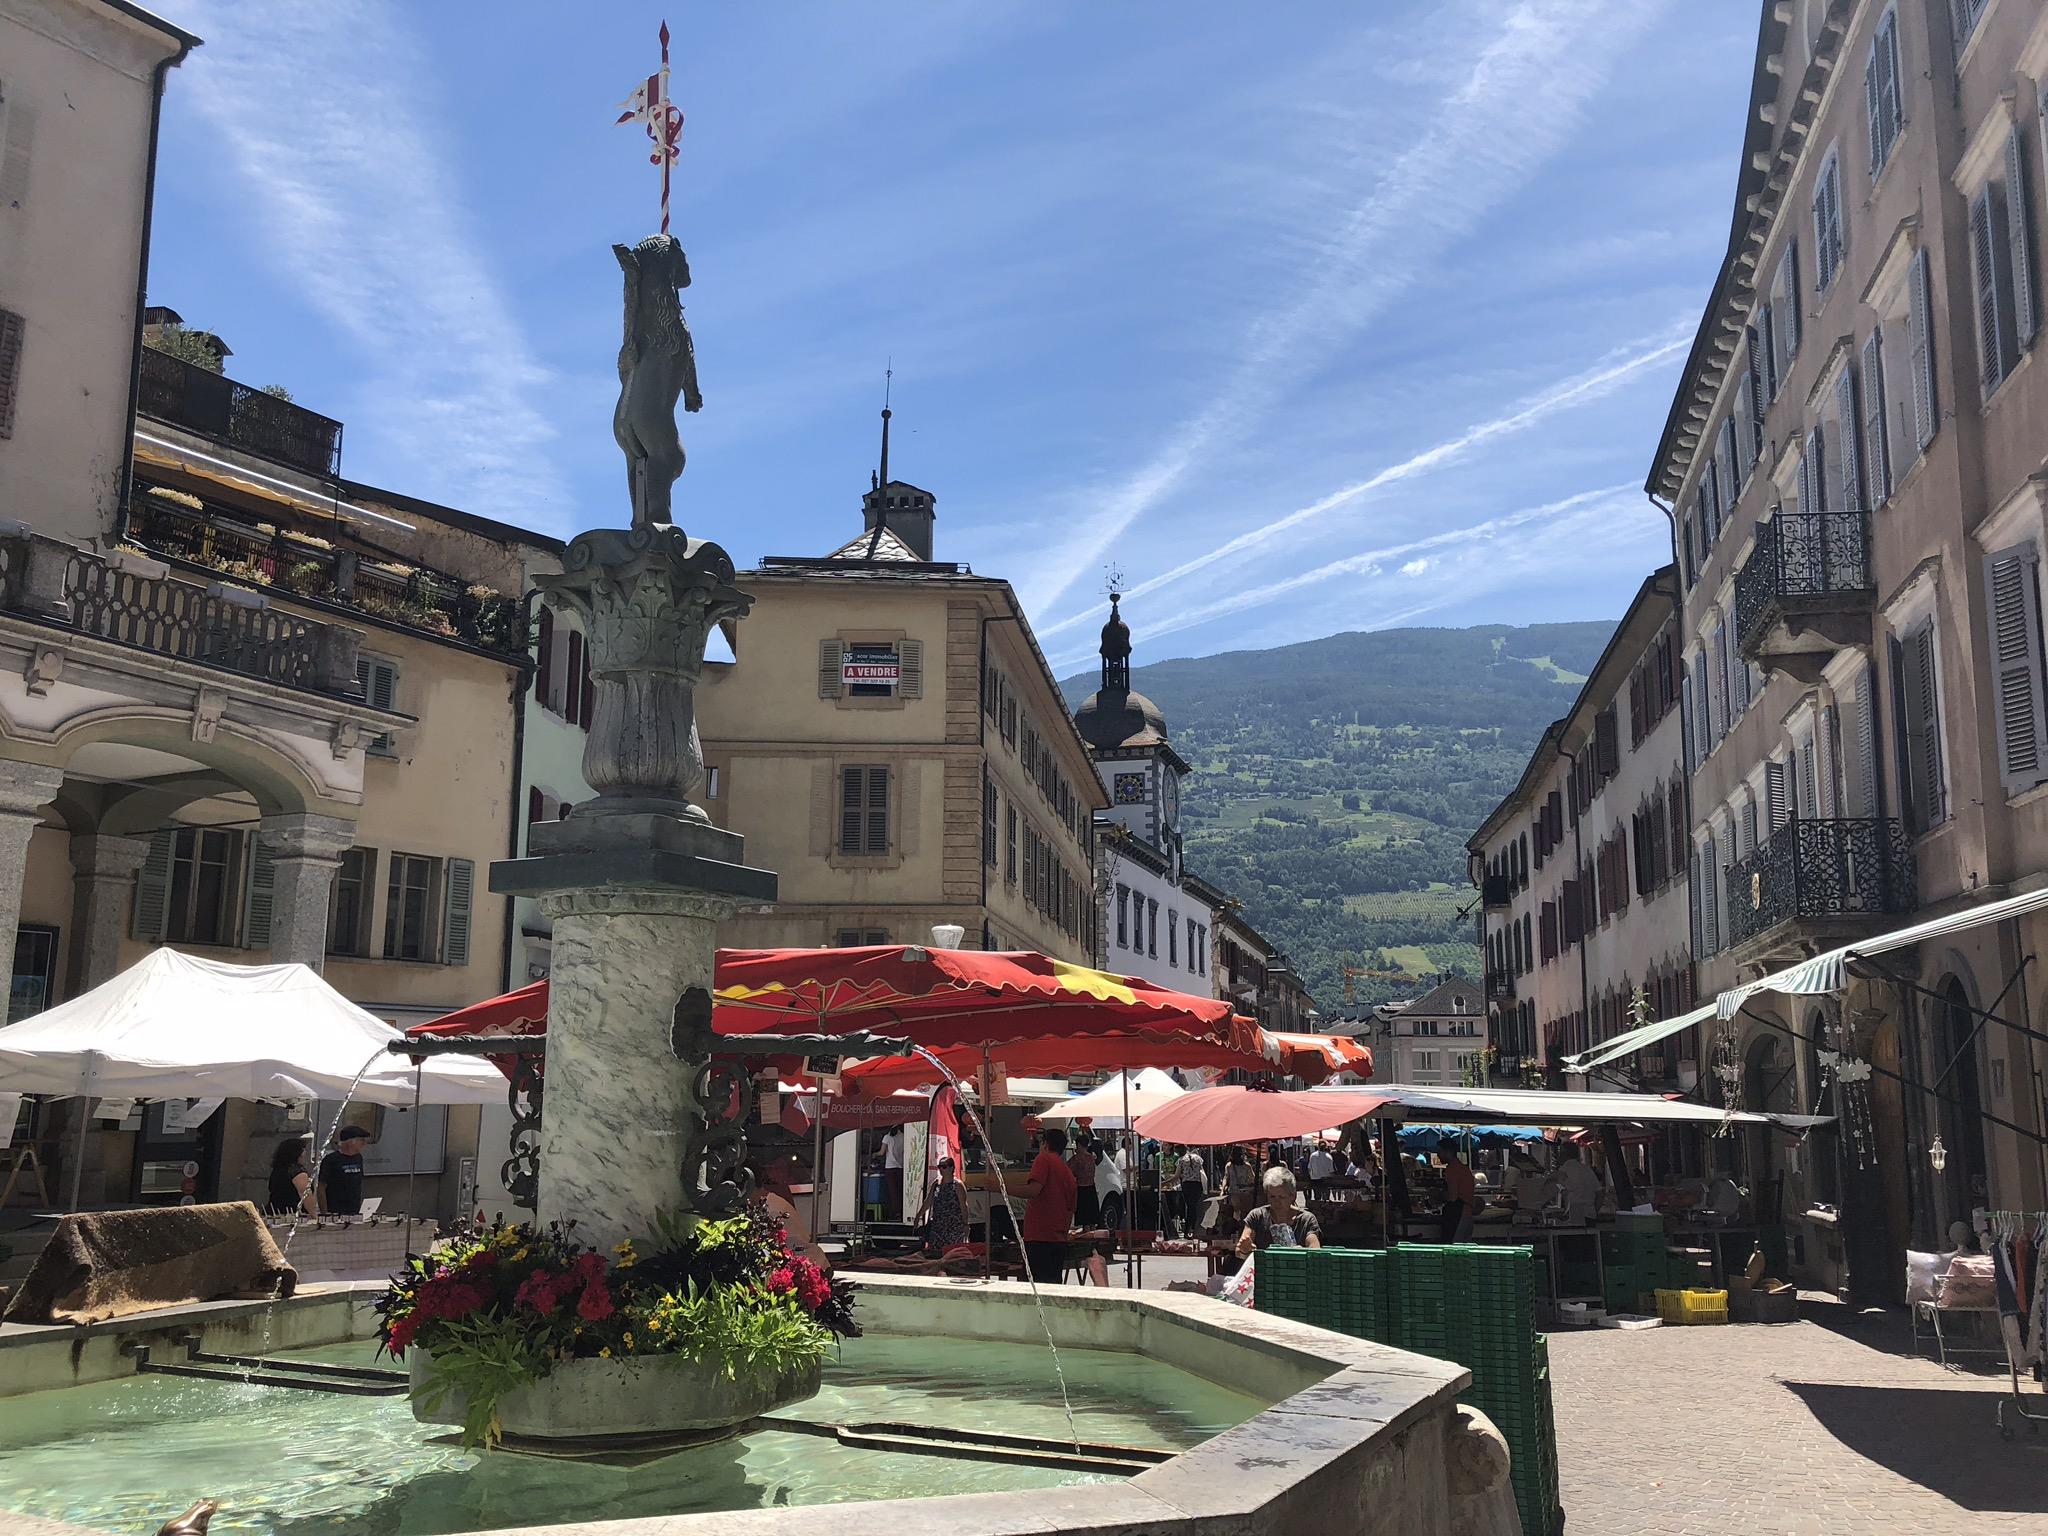 Sion, Rhone Valley Valais